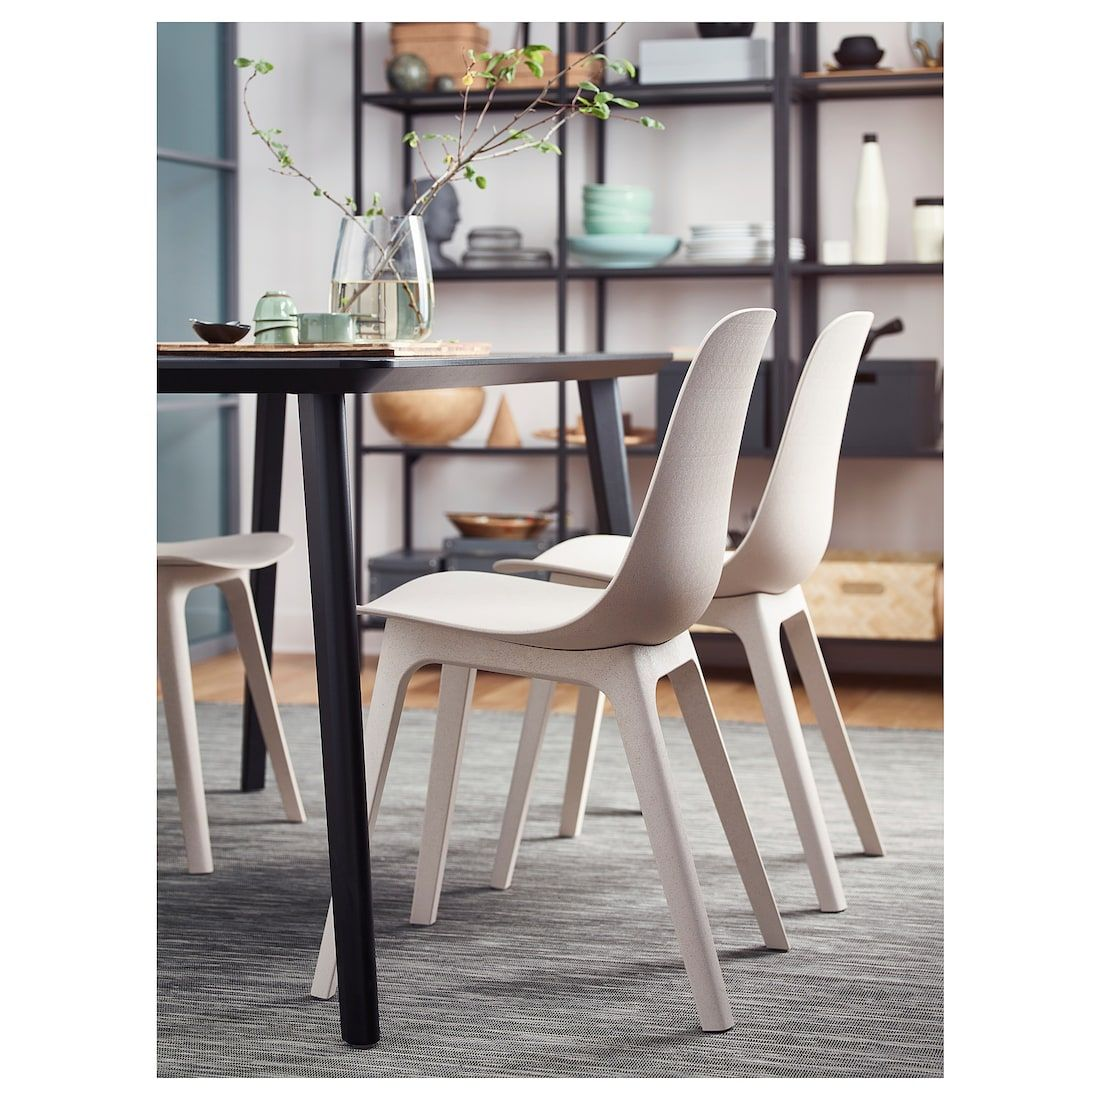 IKEA ODGER White, Beige Chair Chair, Wayfair living room